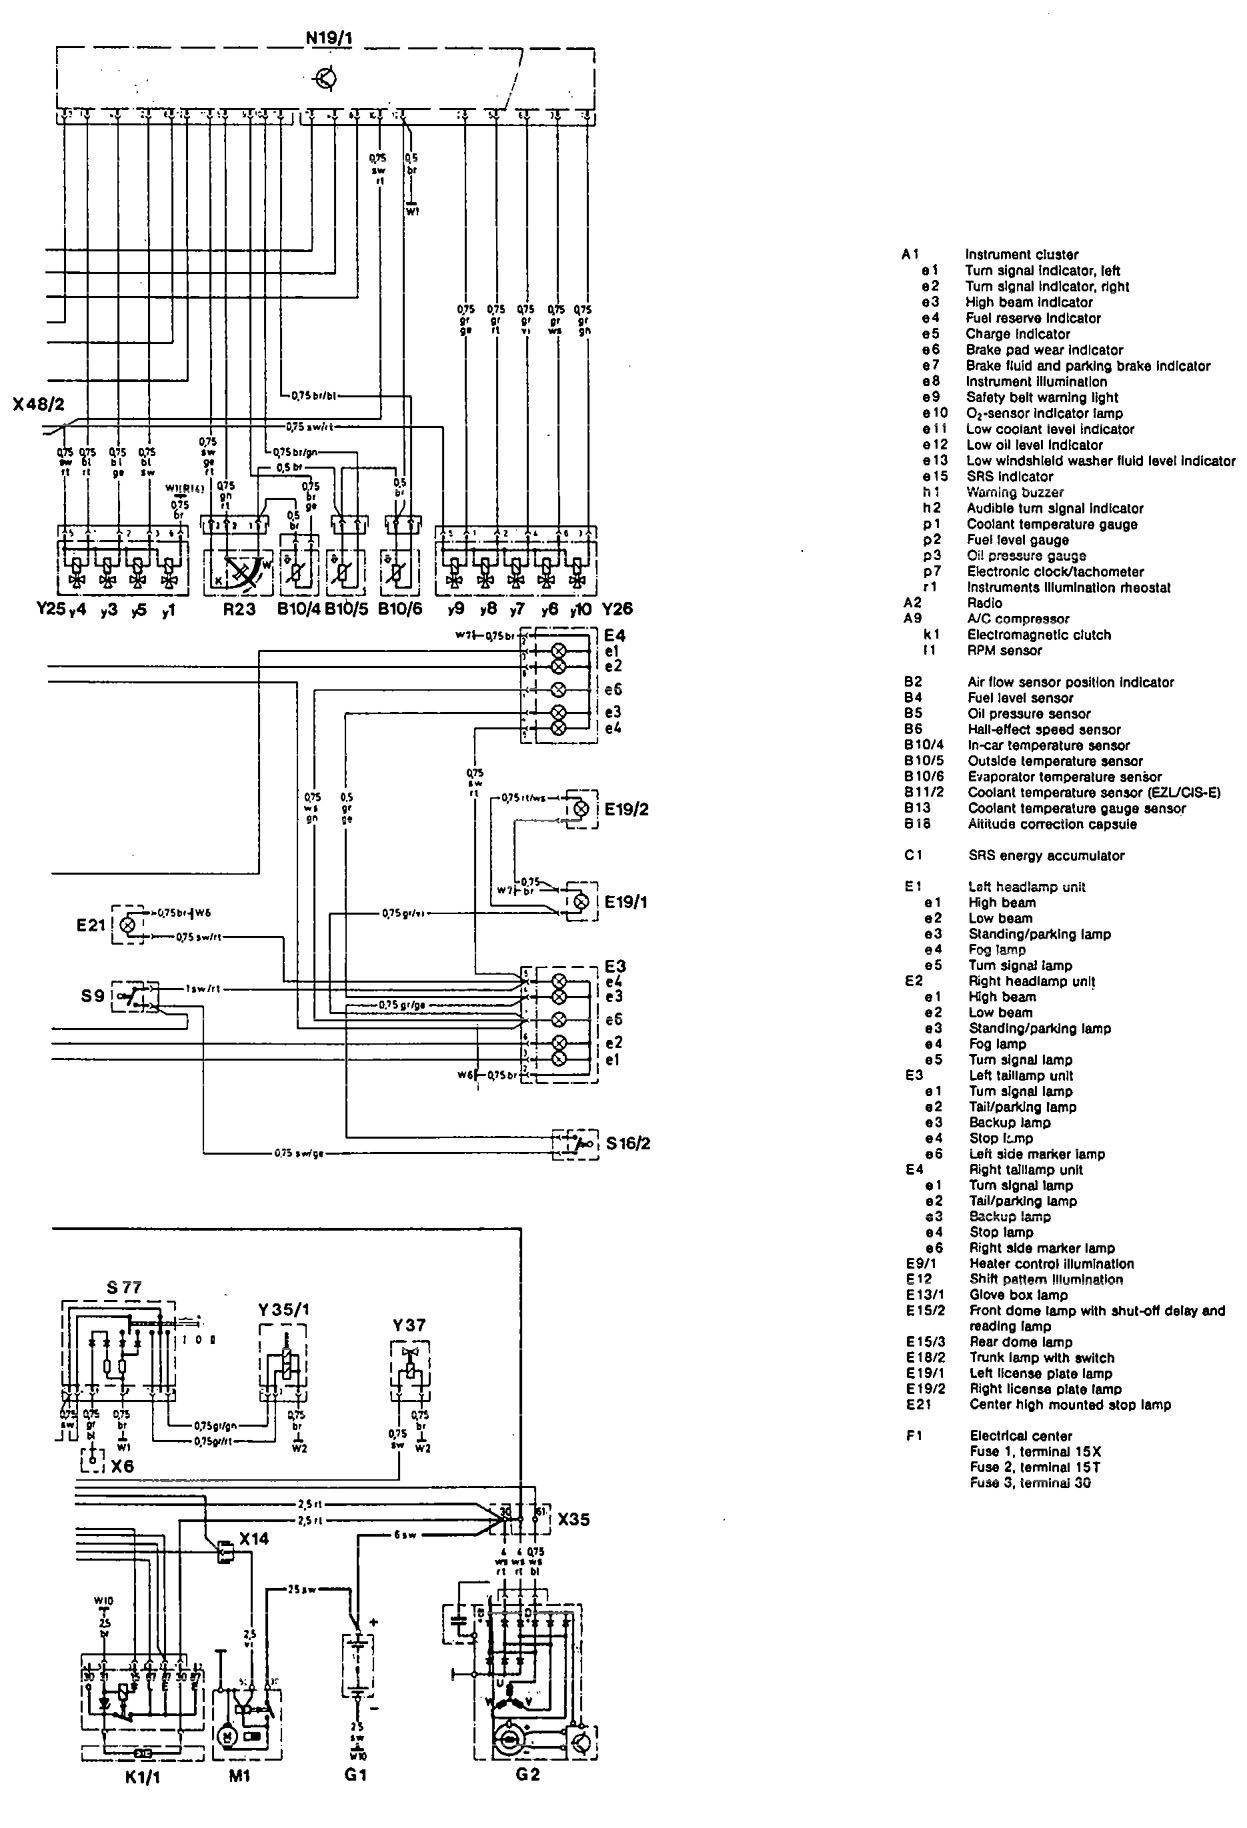 Mercedes Benz Lights Wiring Diagram